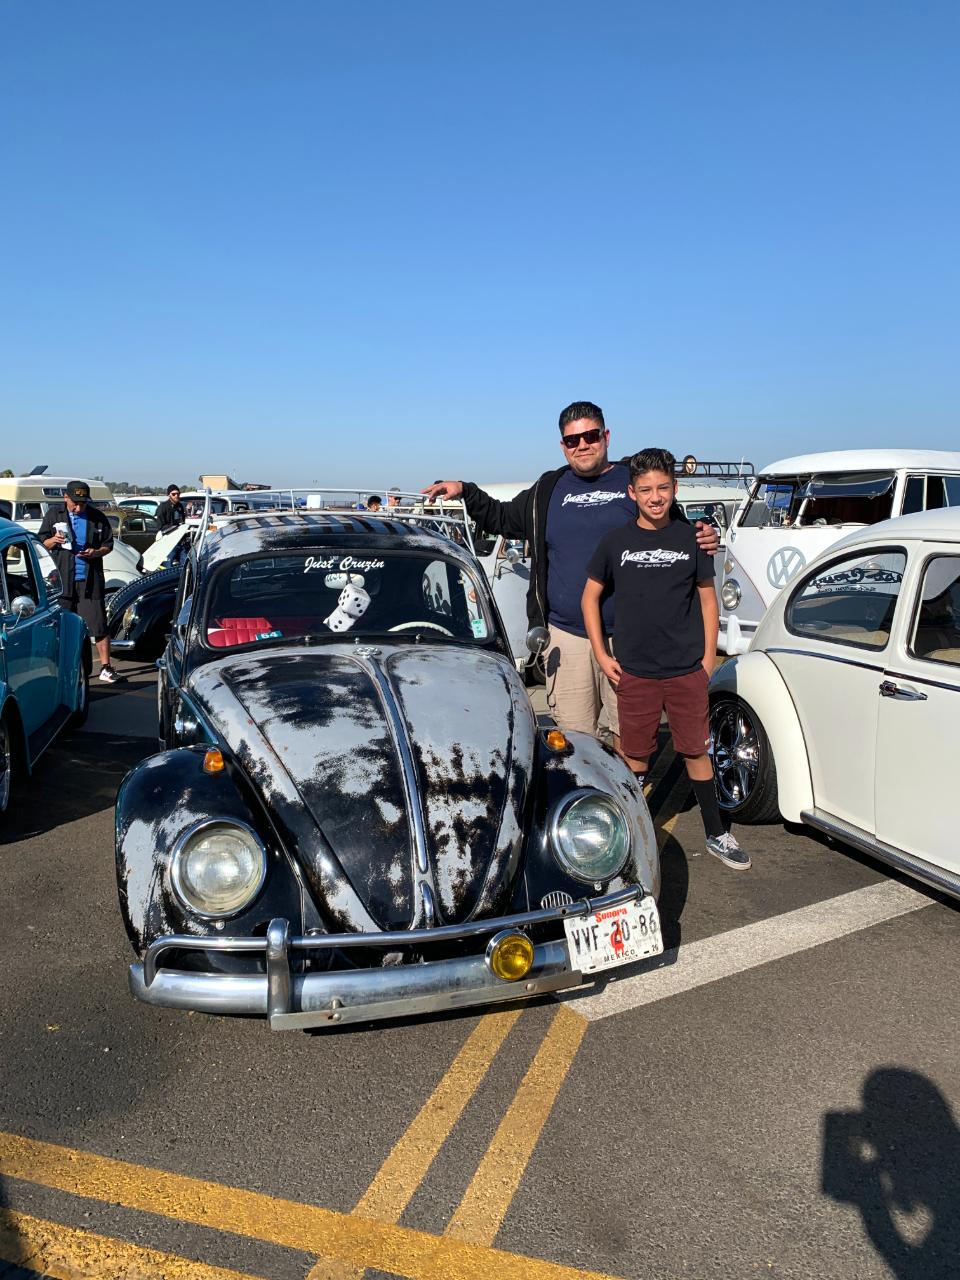 Juan Olivas with his 1964 VW Beetle